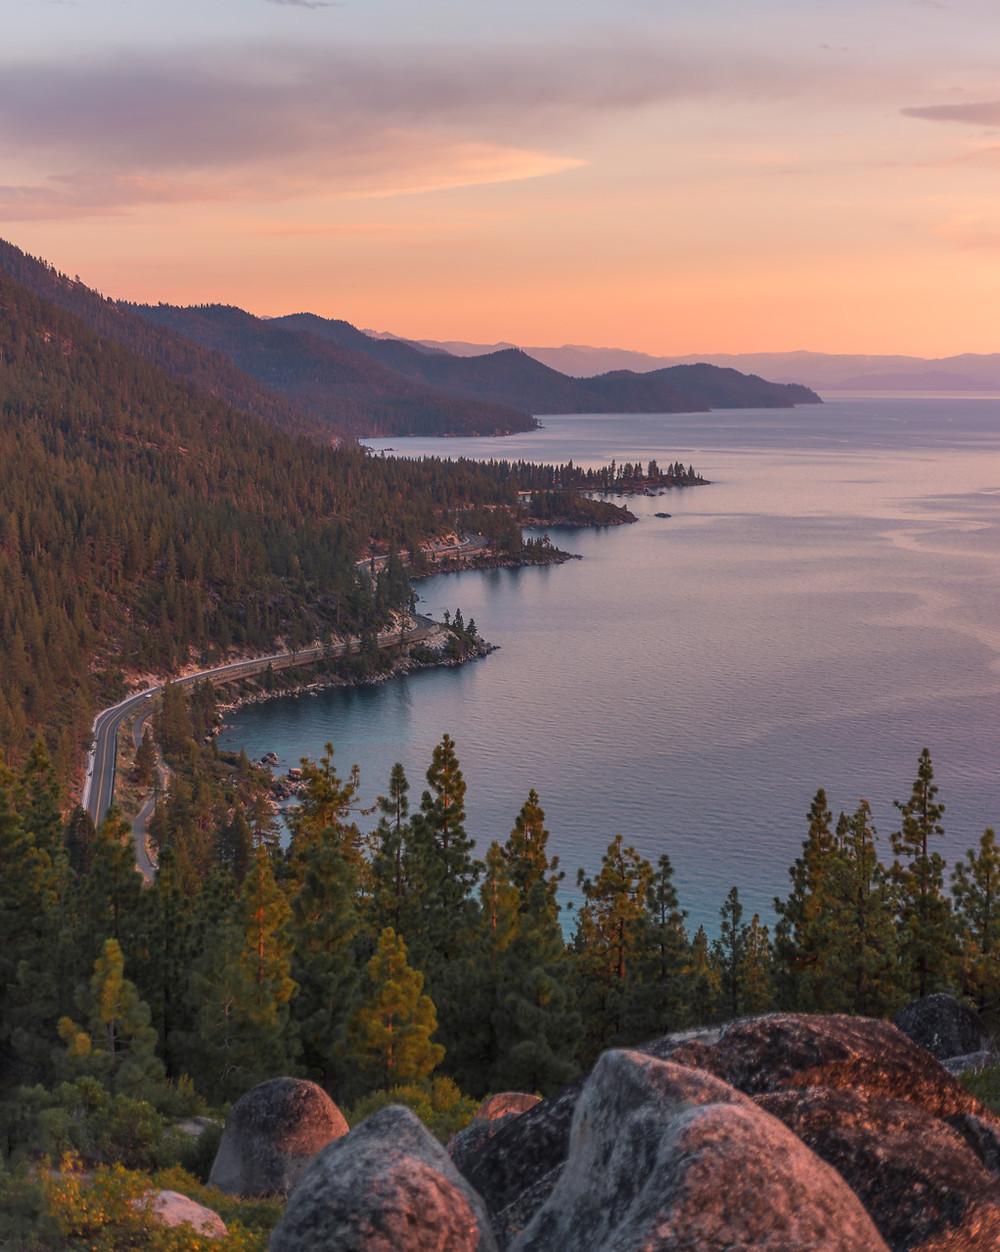 Sunset views from Monkey Rock in Lake Tahoe Nevada